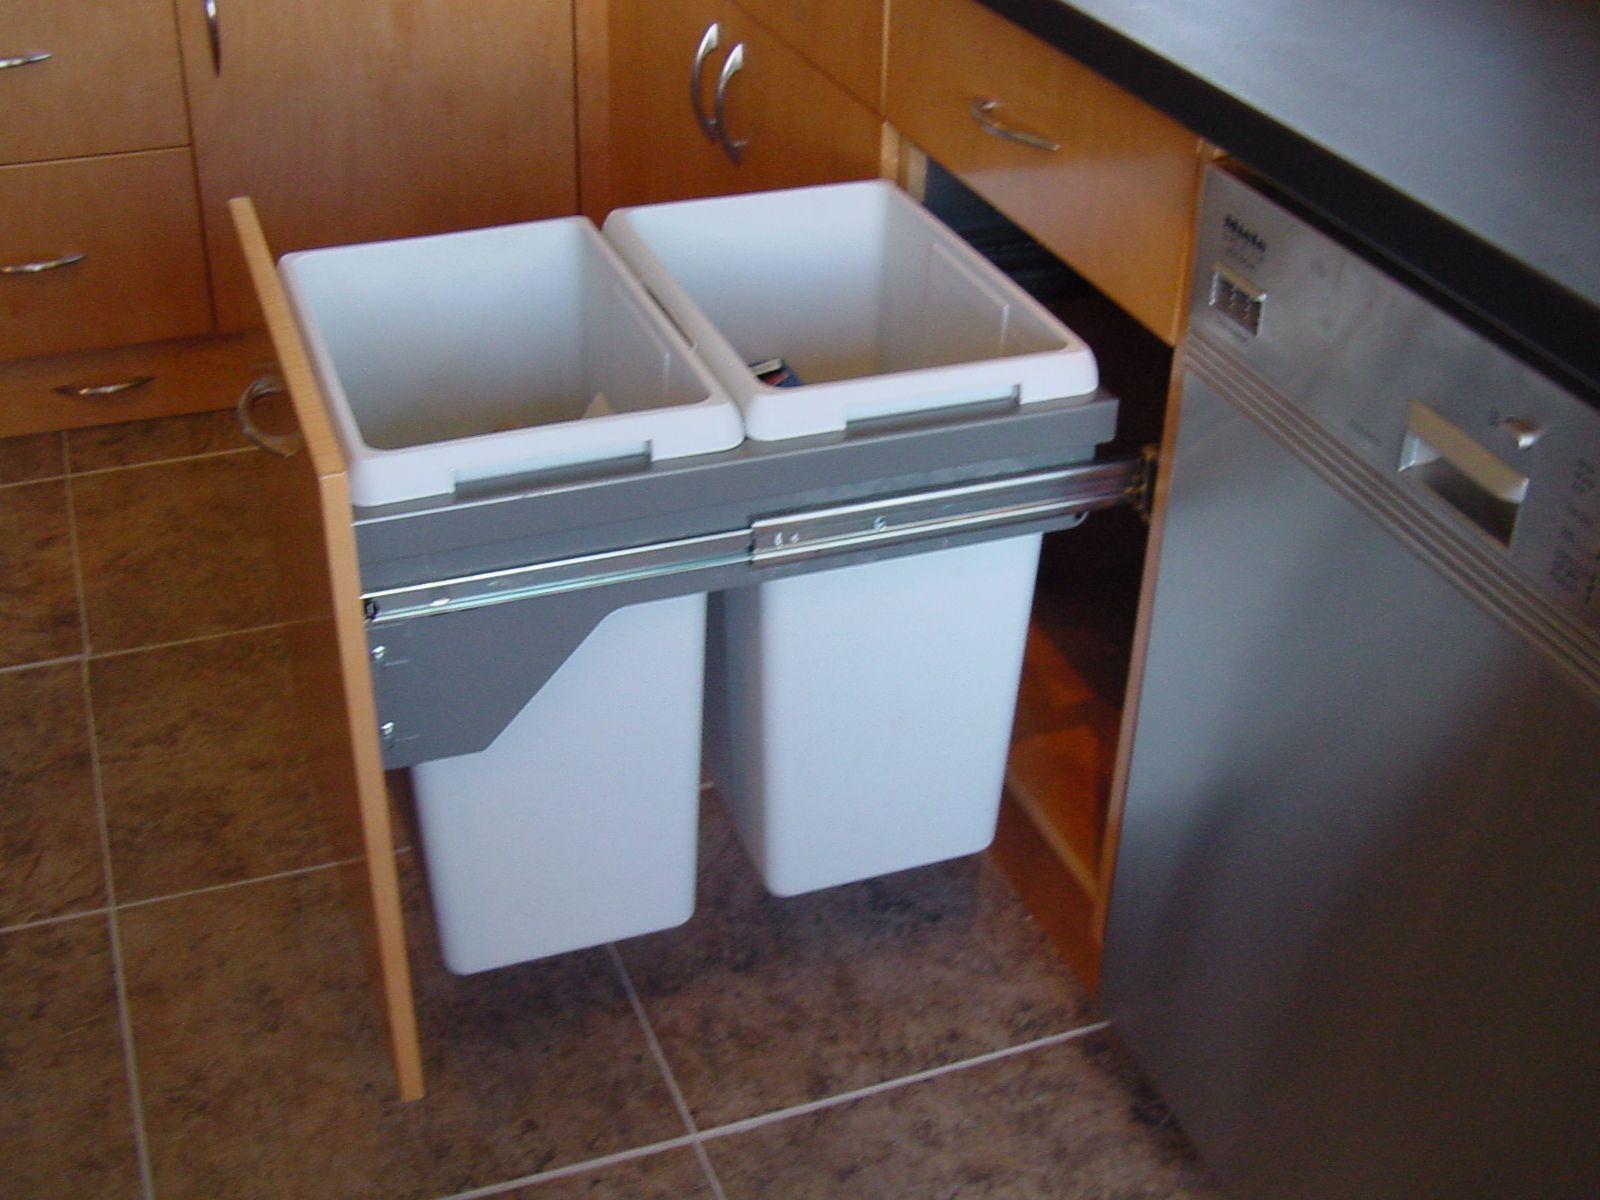 trash and compost bin kitchen drawers cabinets yahoo image